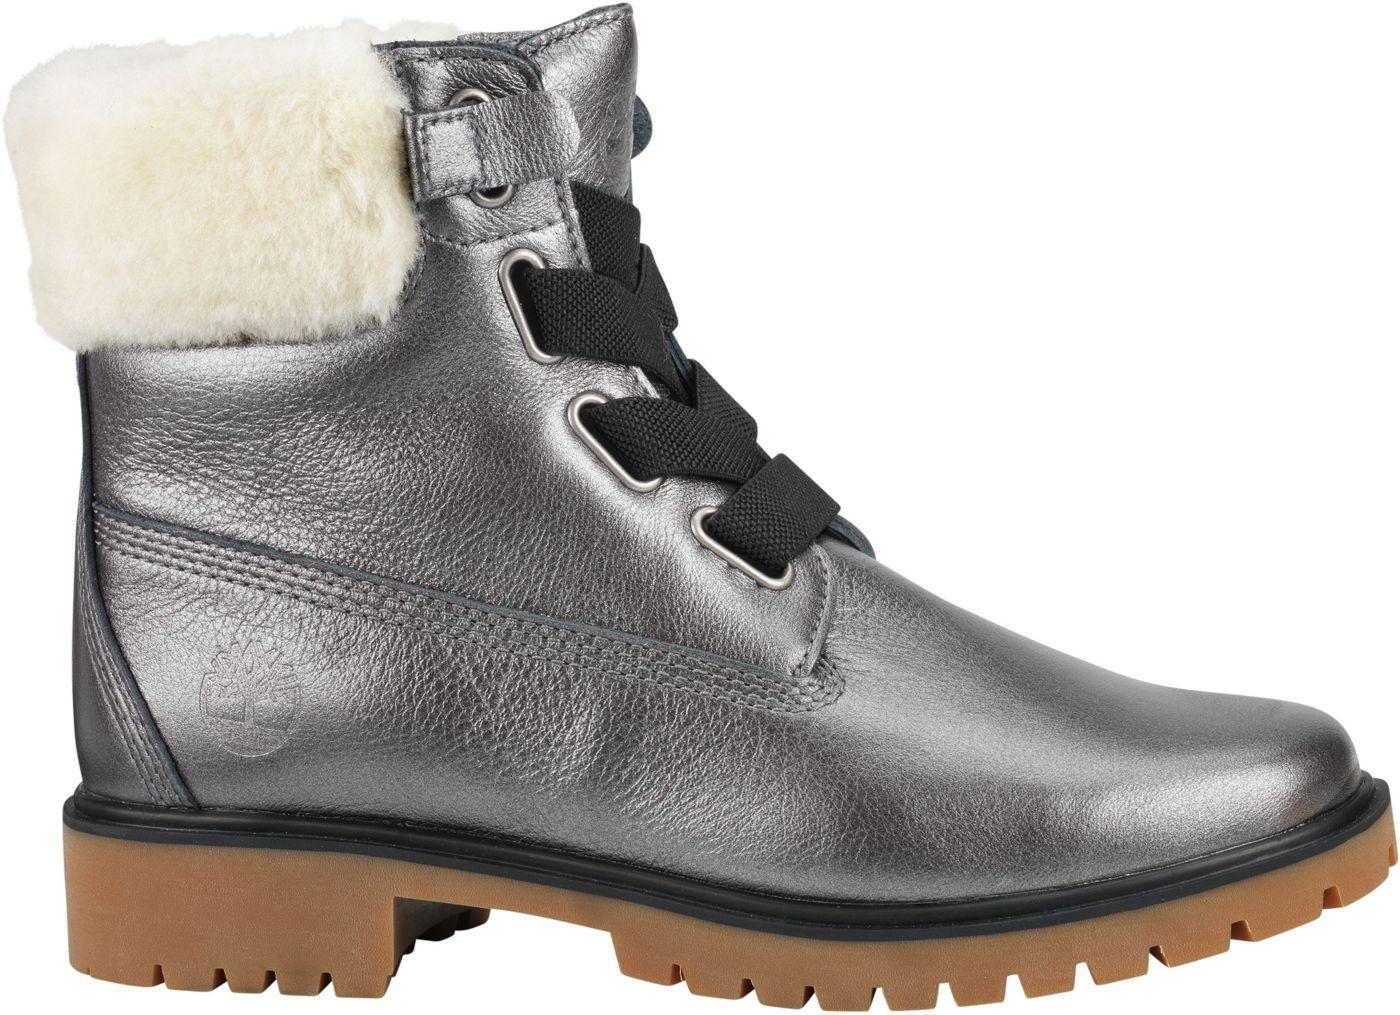 Timberland Women's Jayne 6'' Shearling Metallic Waterproof Casual Boots